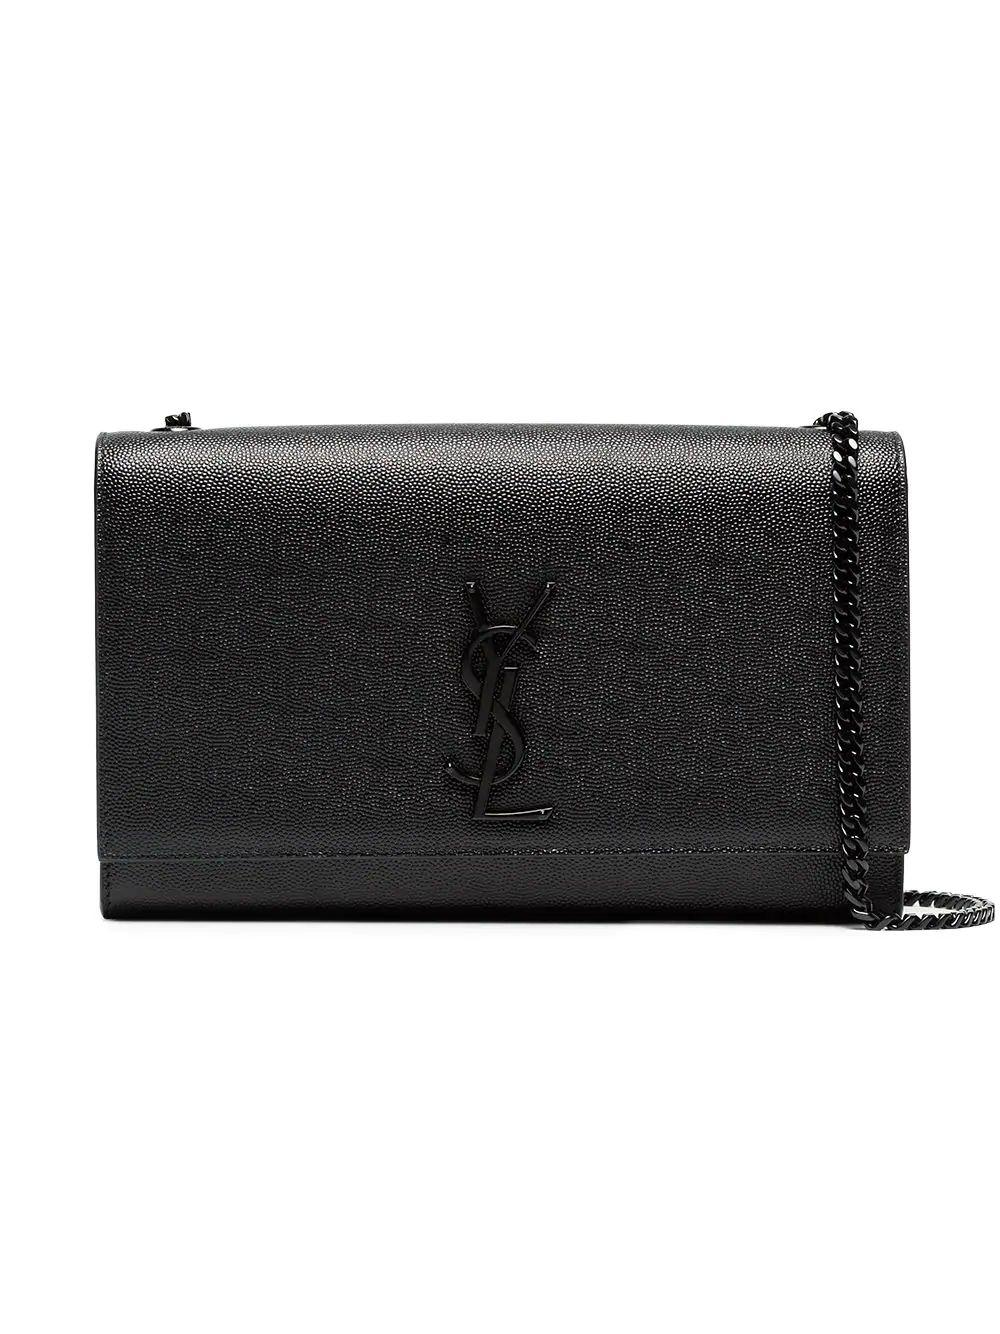 Kate Medium Bag With Chain Strap Item # 364021BOW0U